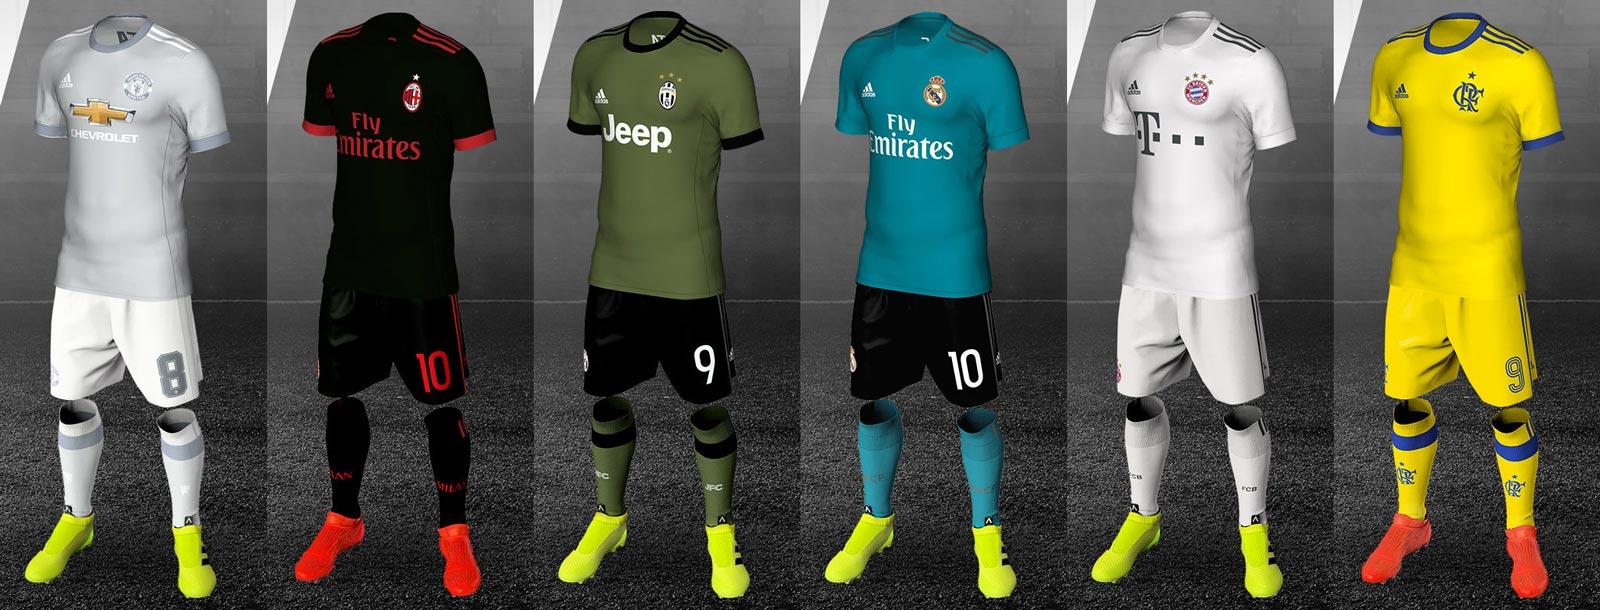 Rediseñá la camiseta del Real Madrid con Adidas Creator Studio ... fcd4dffb9b067